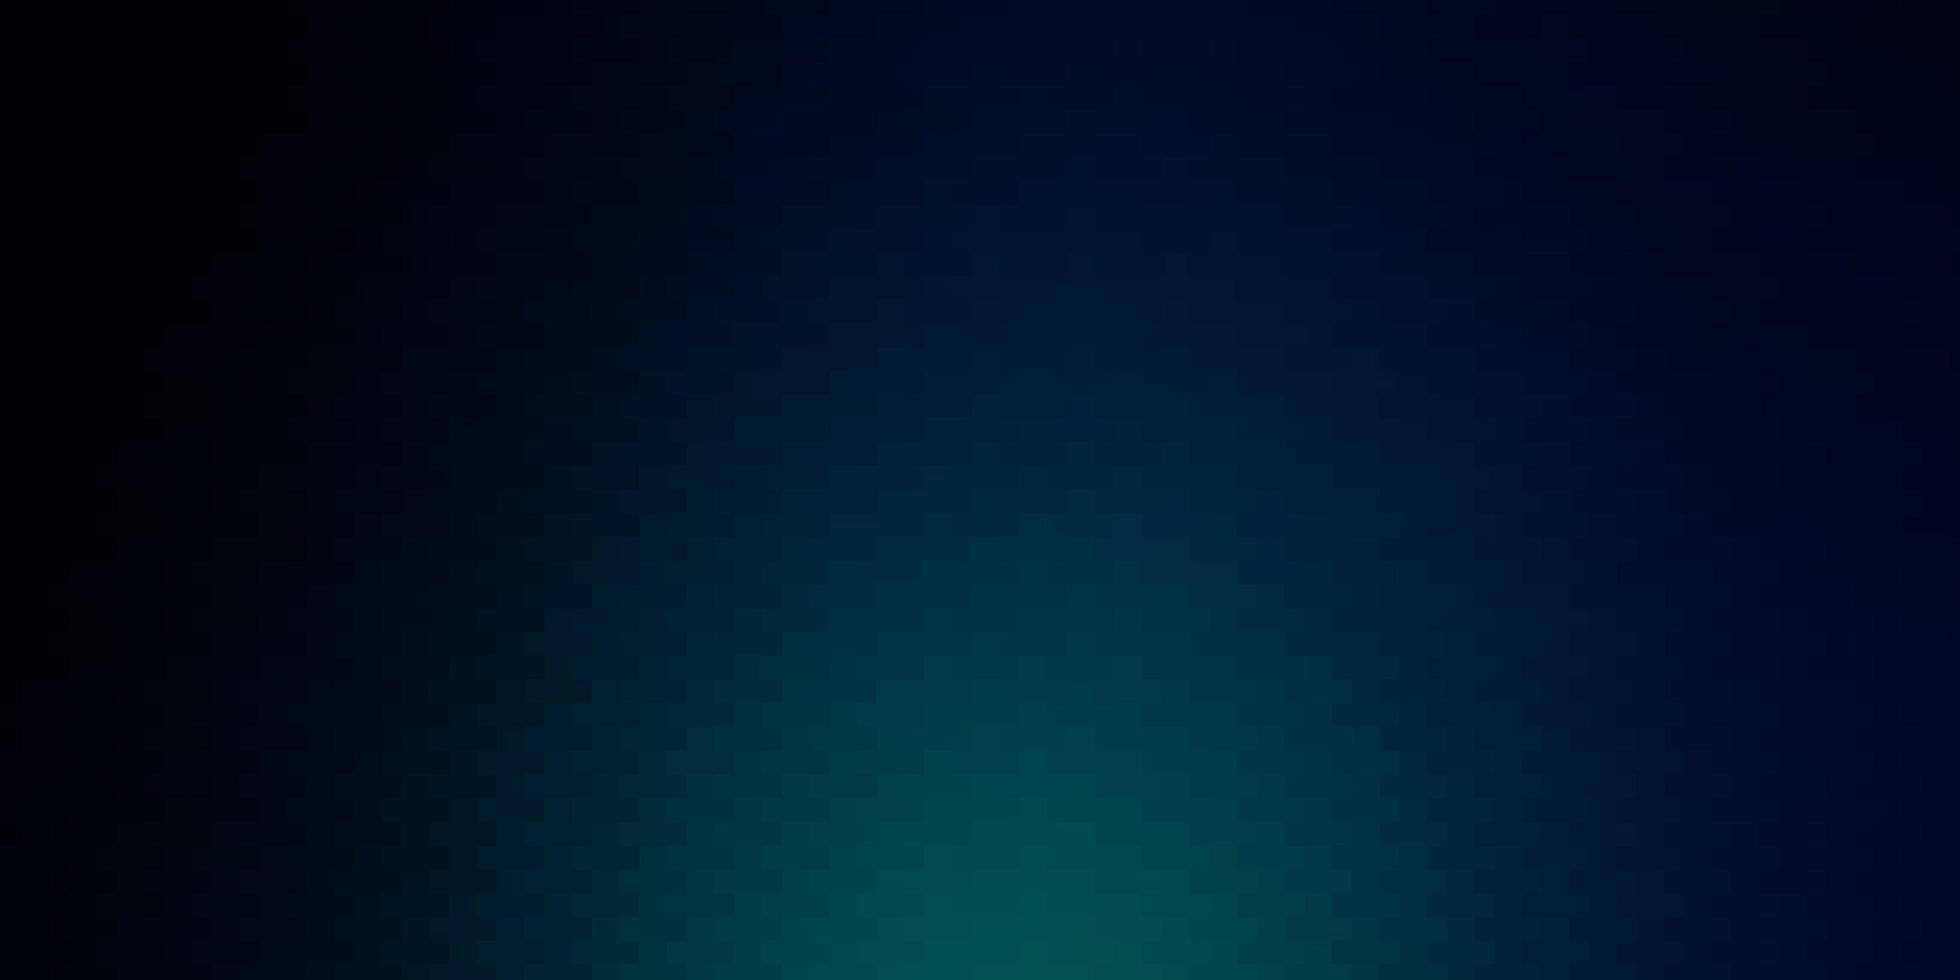 mörkblå vektor bakgrund med rektanglar